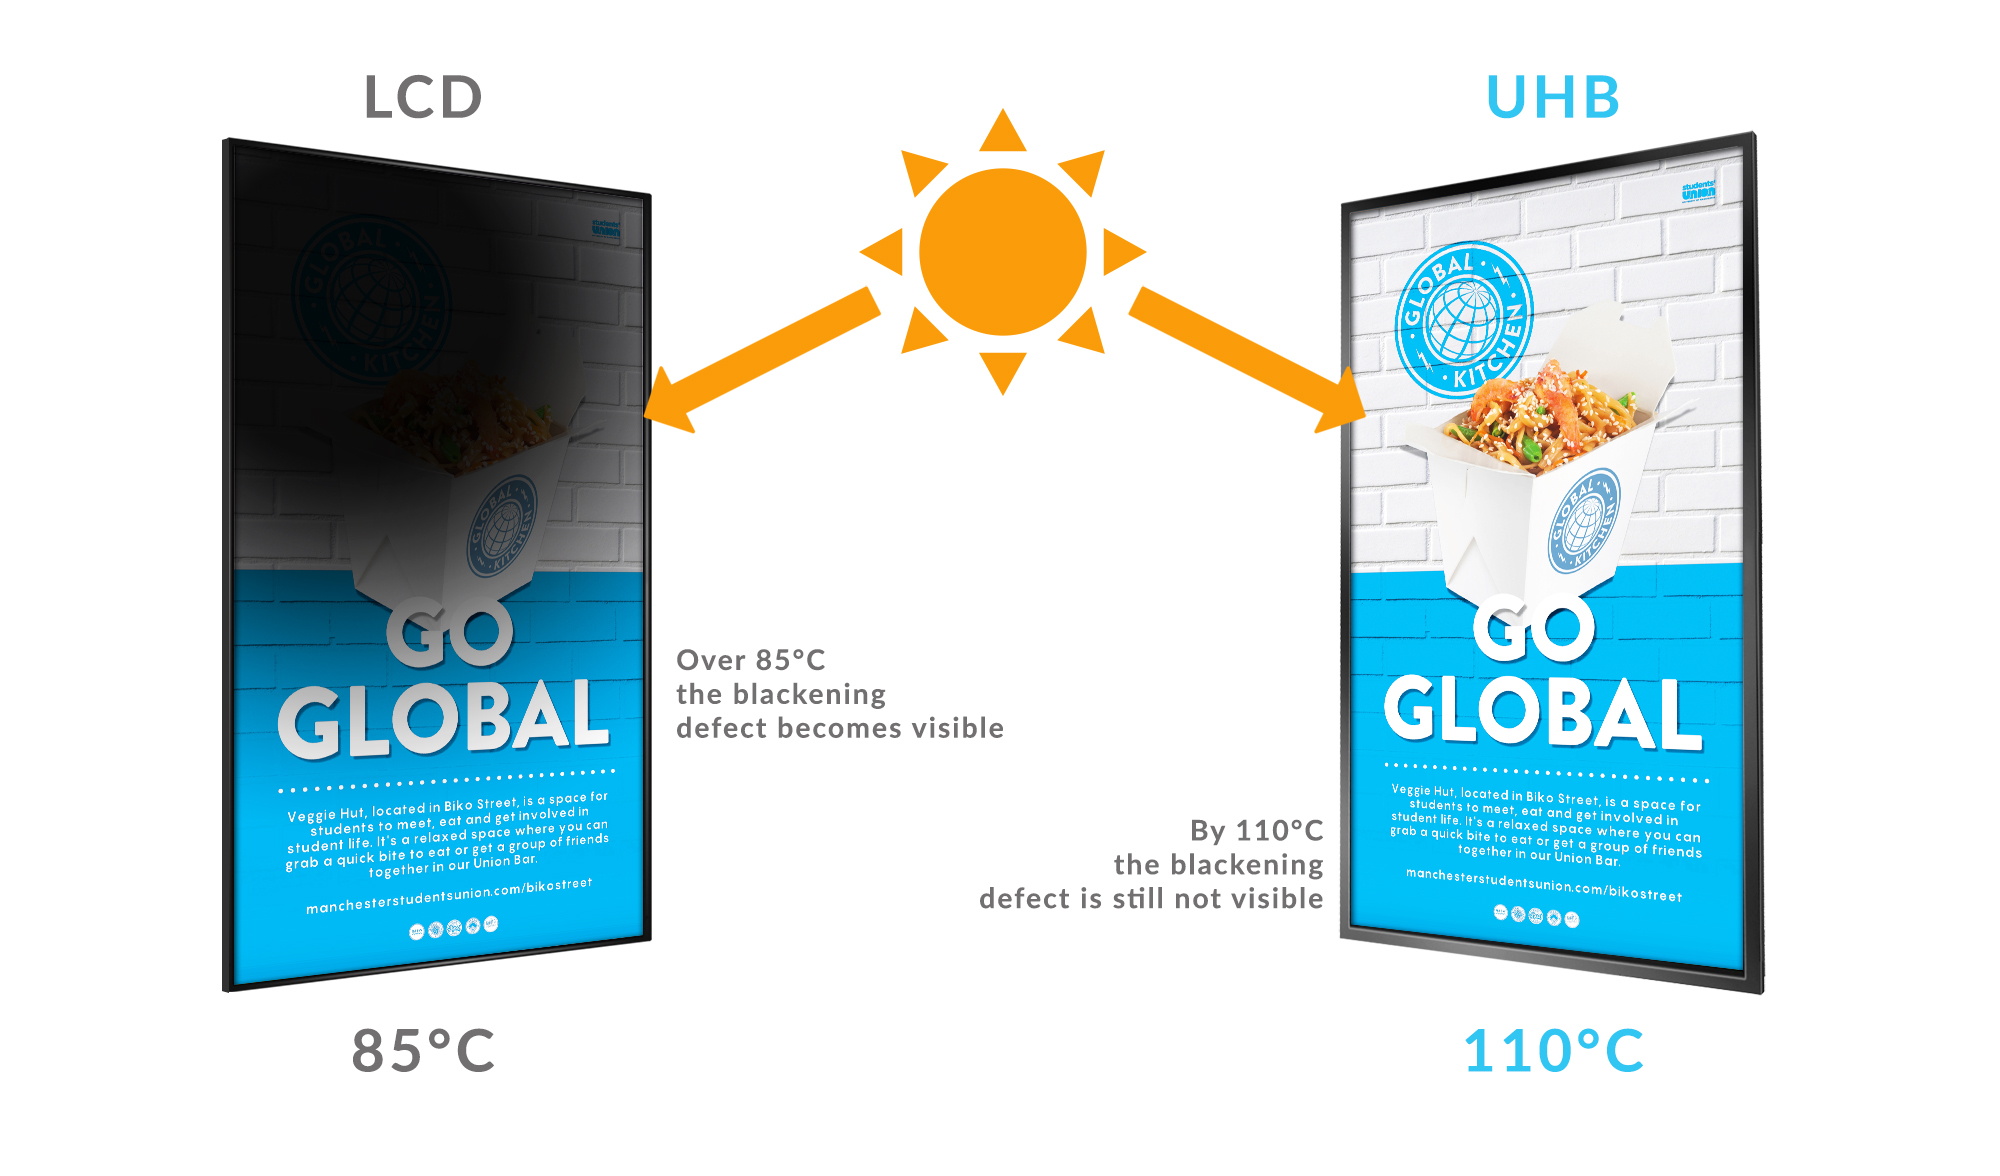 digital signage ultra high brightness sunlight readable